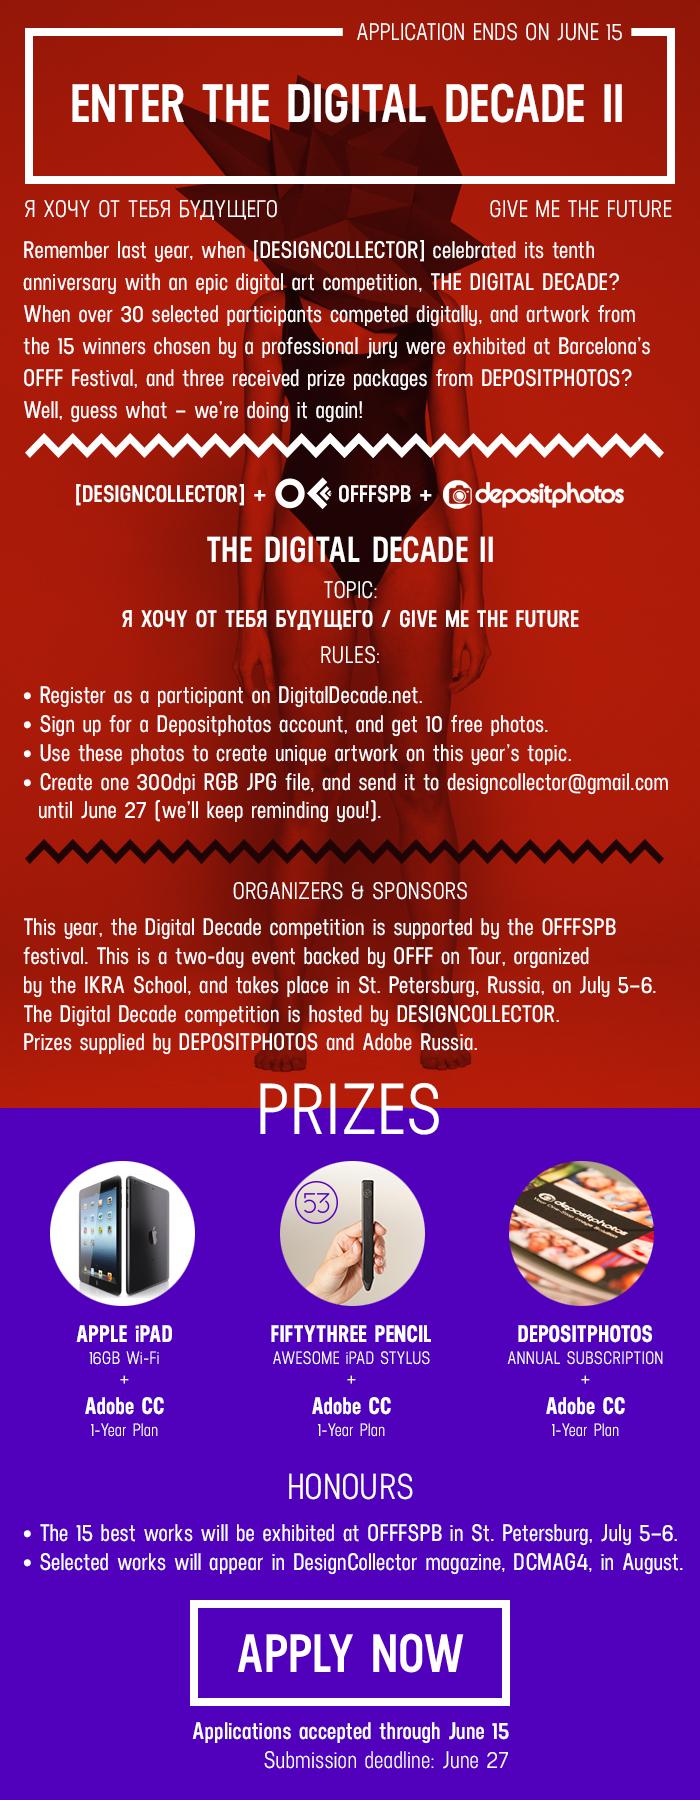 tumblr n6nw84lTve1stxm3zo1 r1 1280 - Torna il Contest Creativo fra DESIGN COLLECTOR e DEPOSITPHOTOS